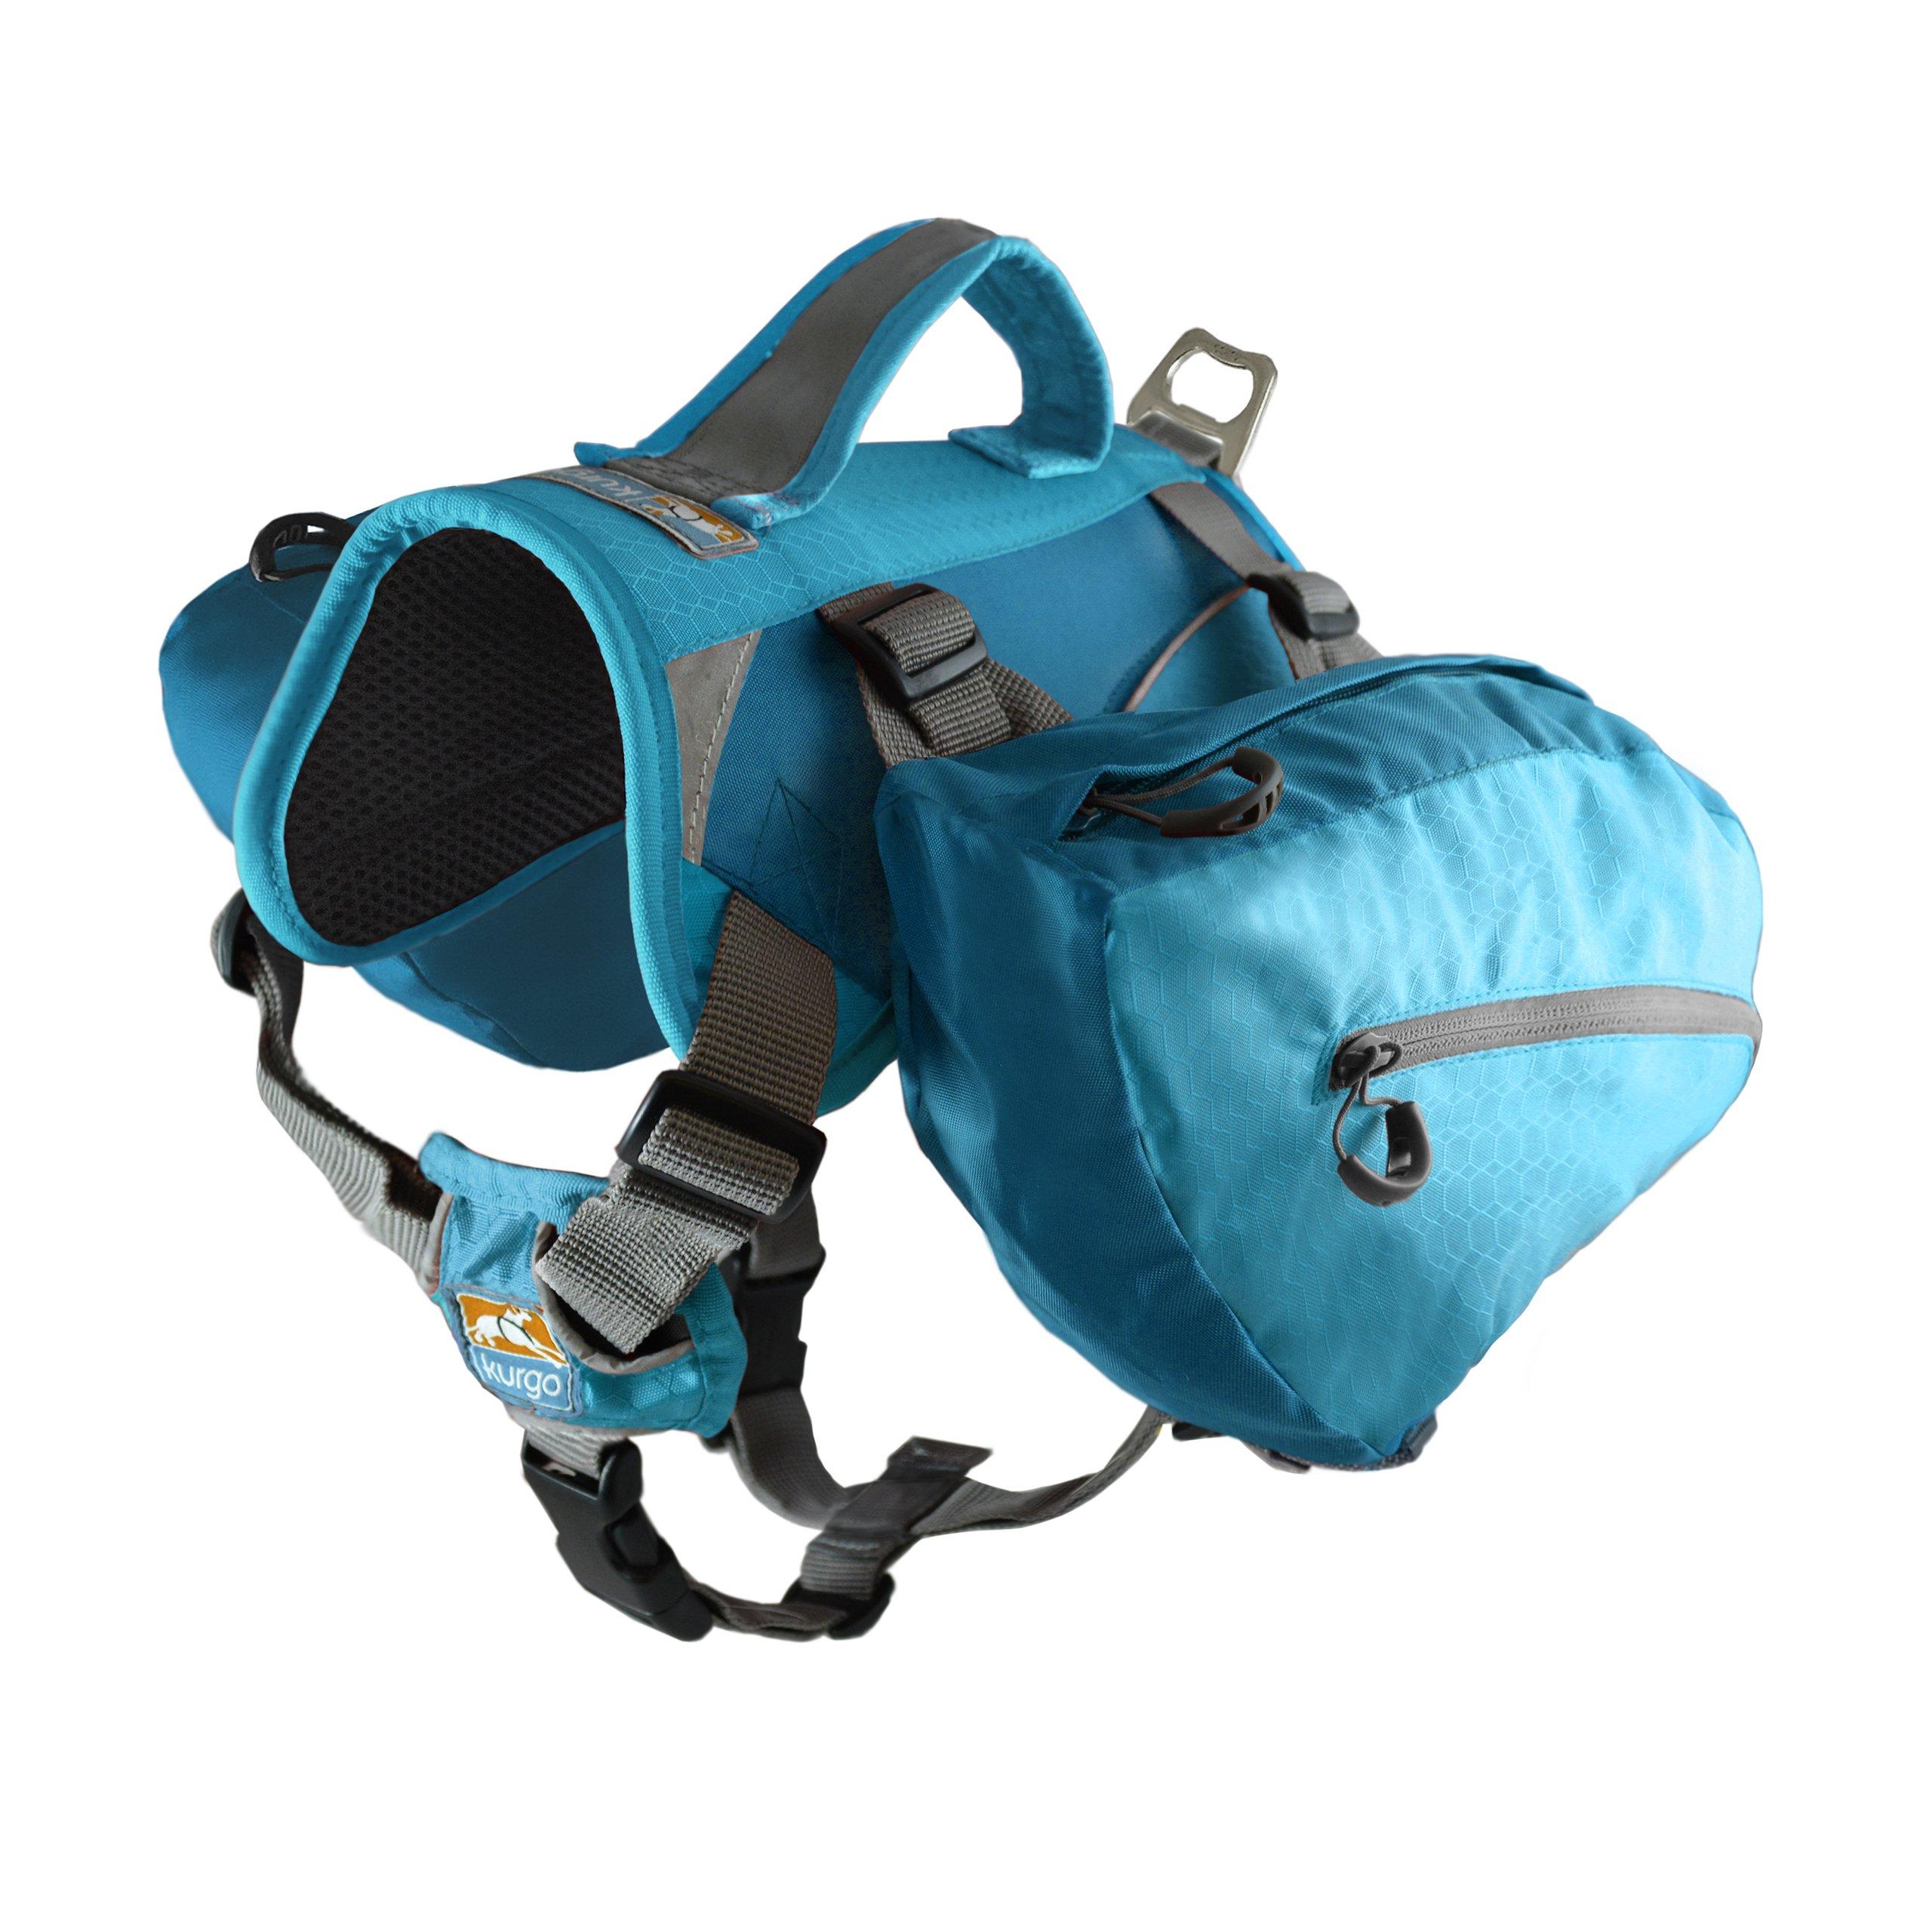 Kurgo Baxter (TM) Dog Backpack for Hiking, Walking or Camping, Coastal Blue